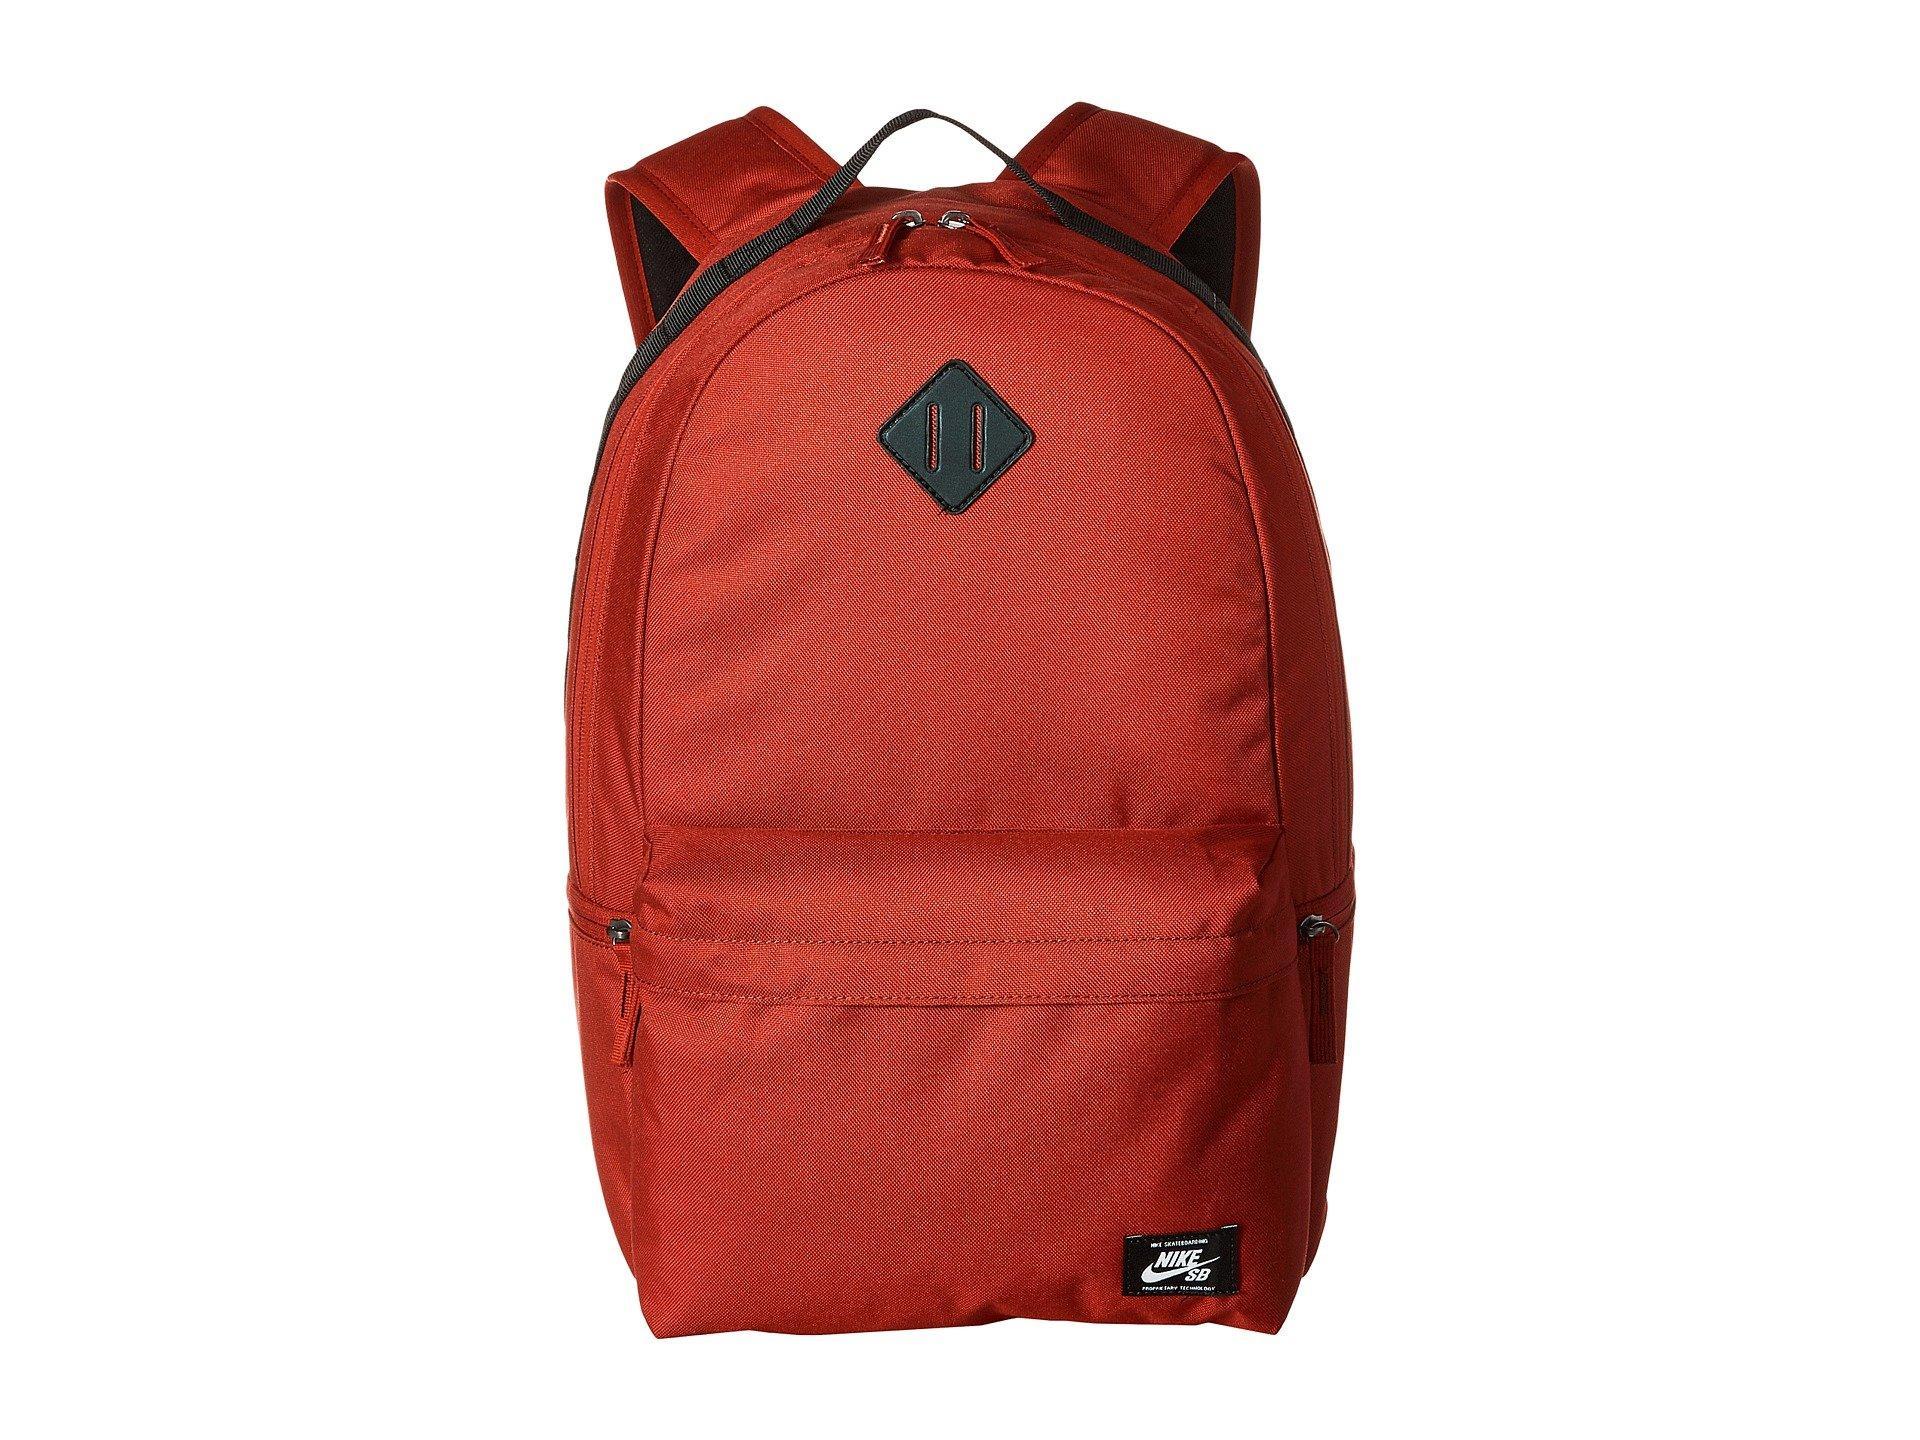 Nike Sb Icon Backpack Red Crush Black White Backpack Bags For Men